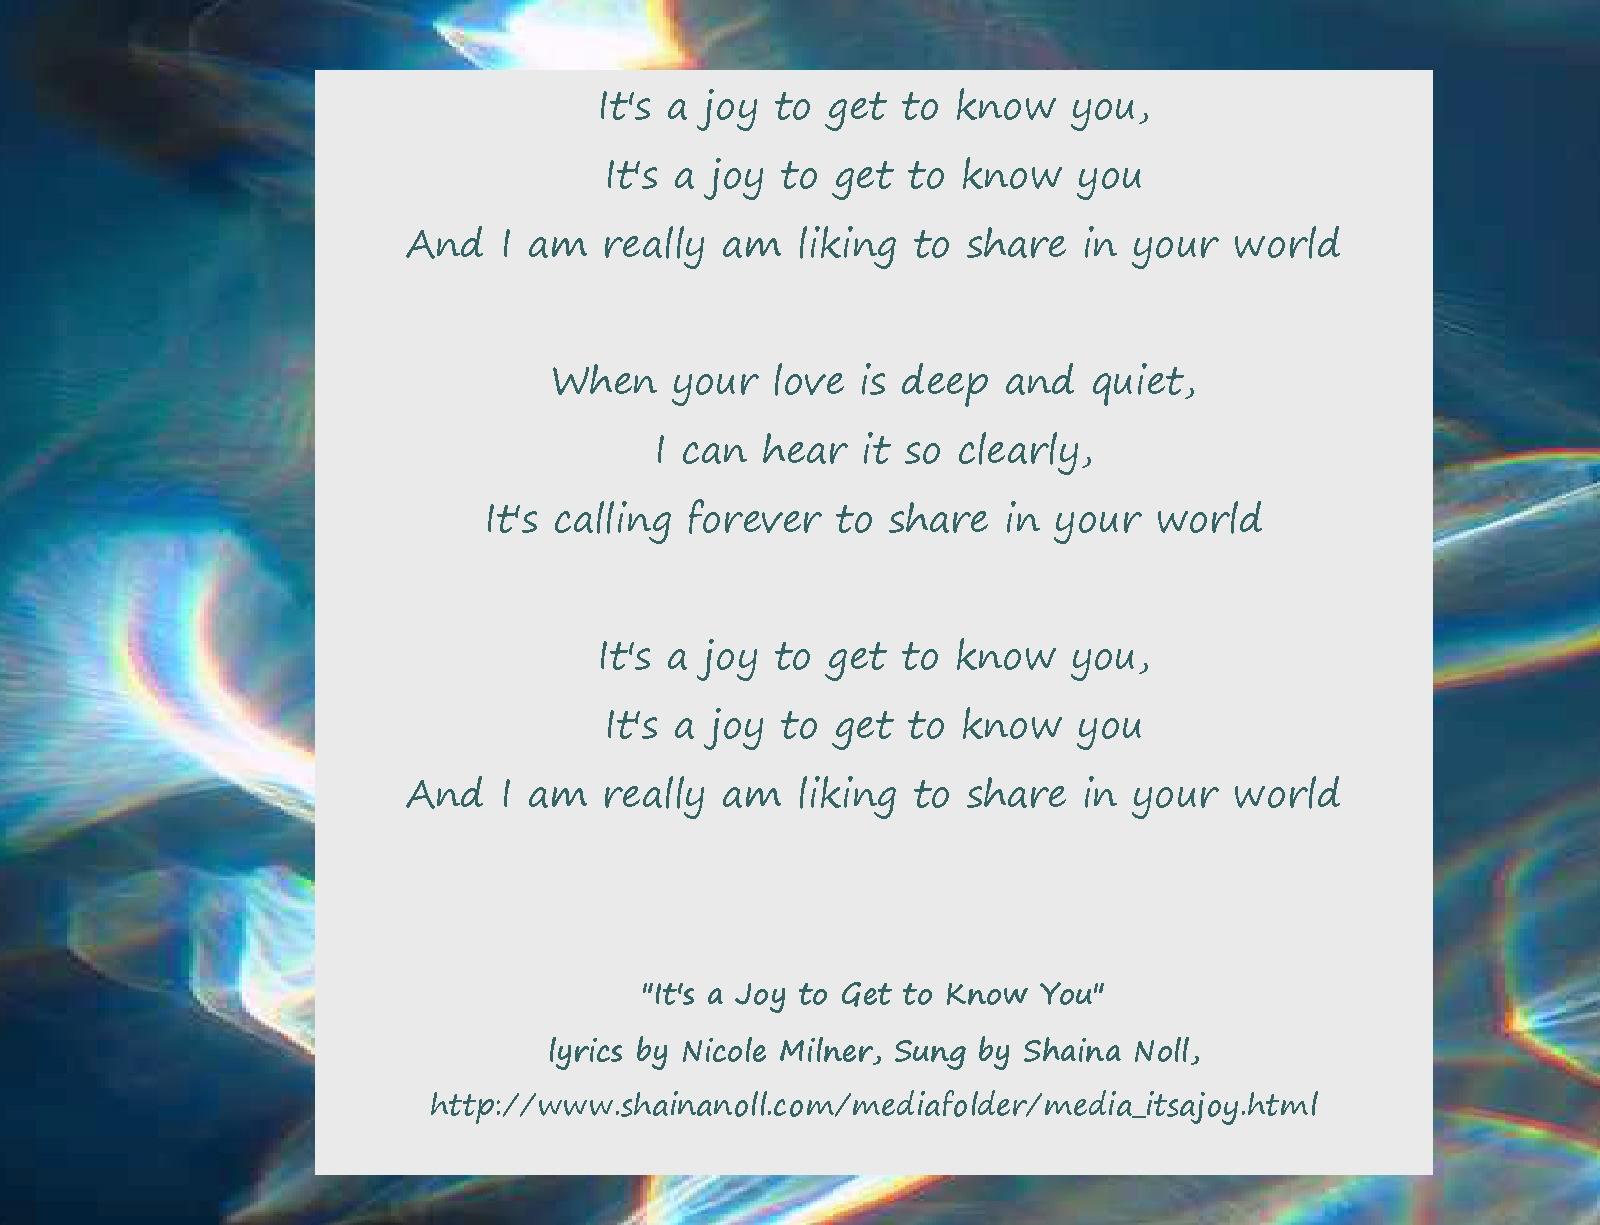 Christmas Carols - Joy To The World Lyrics | MetroLyrics